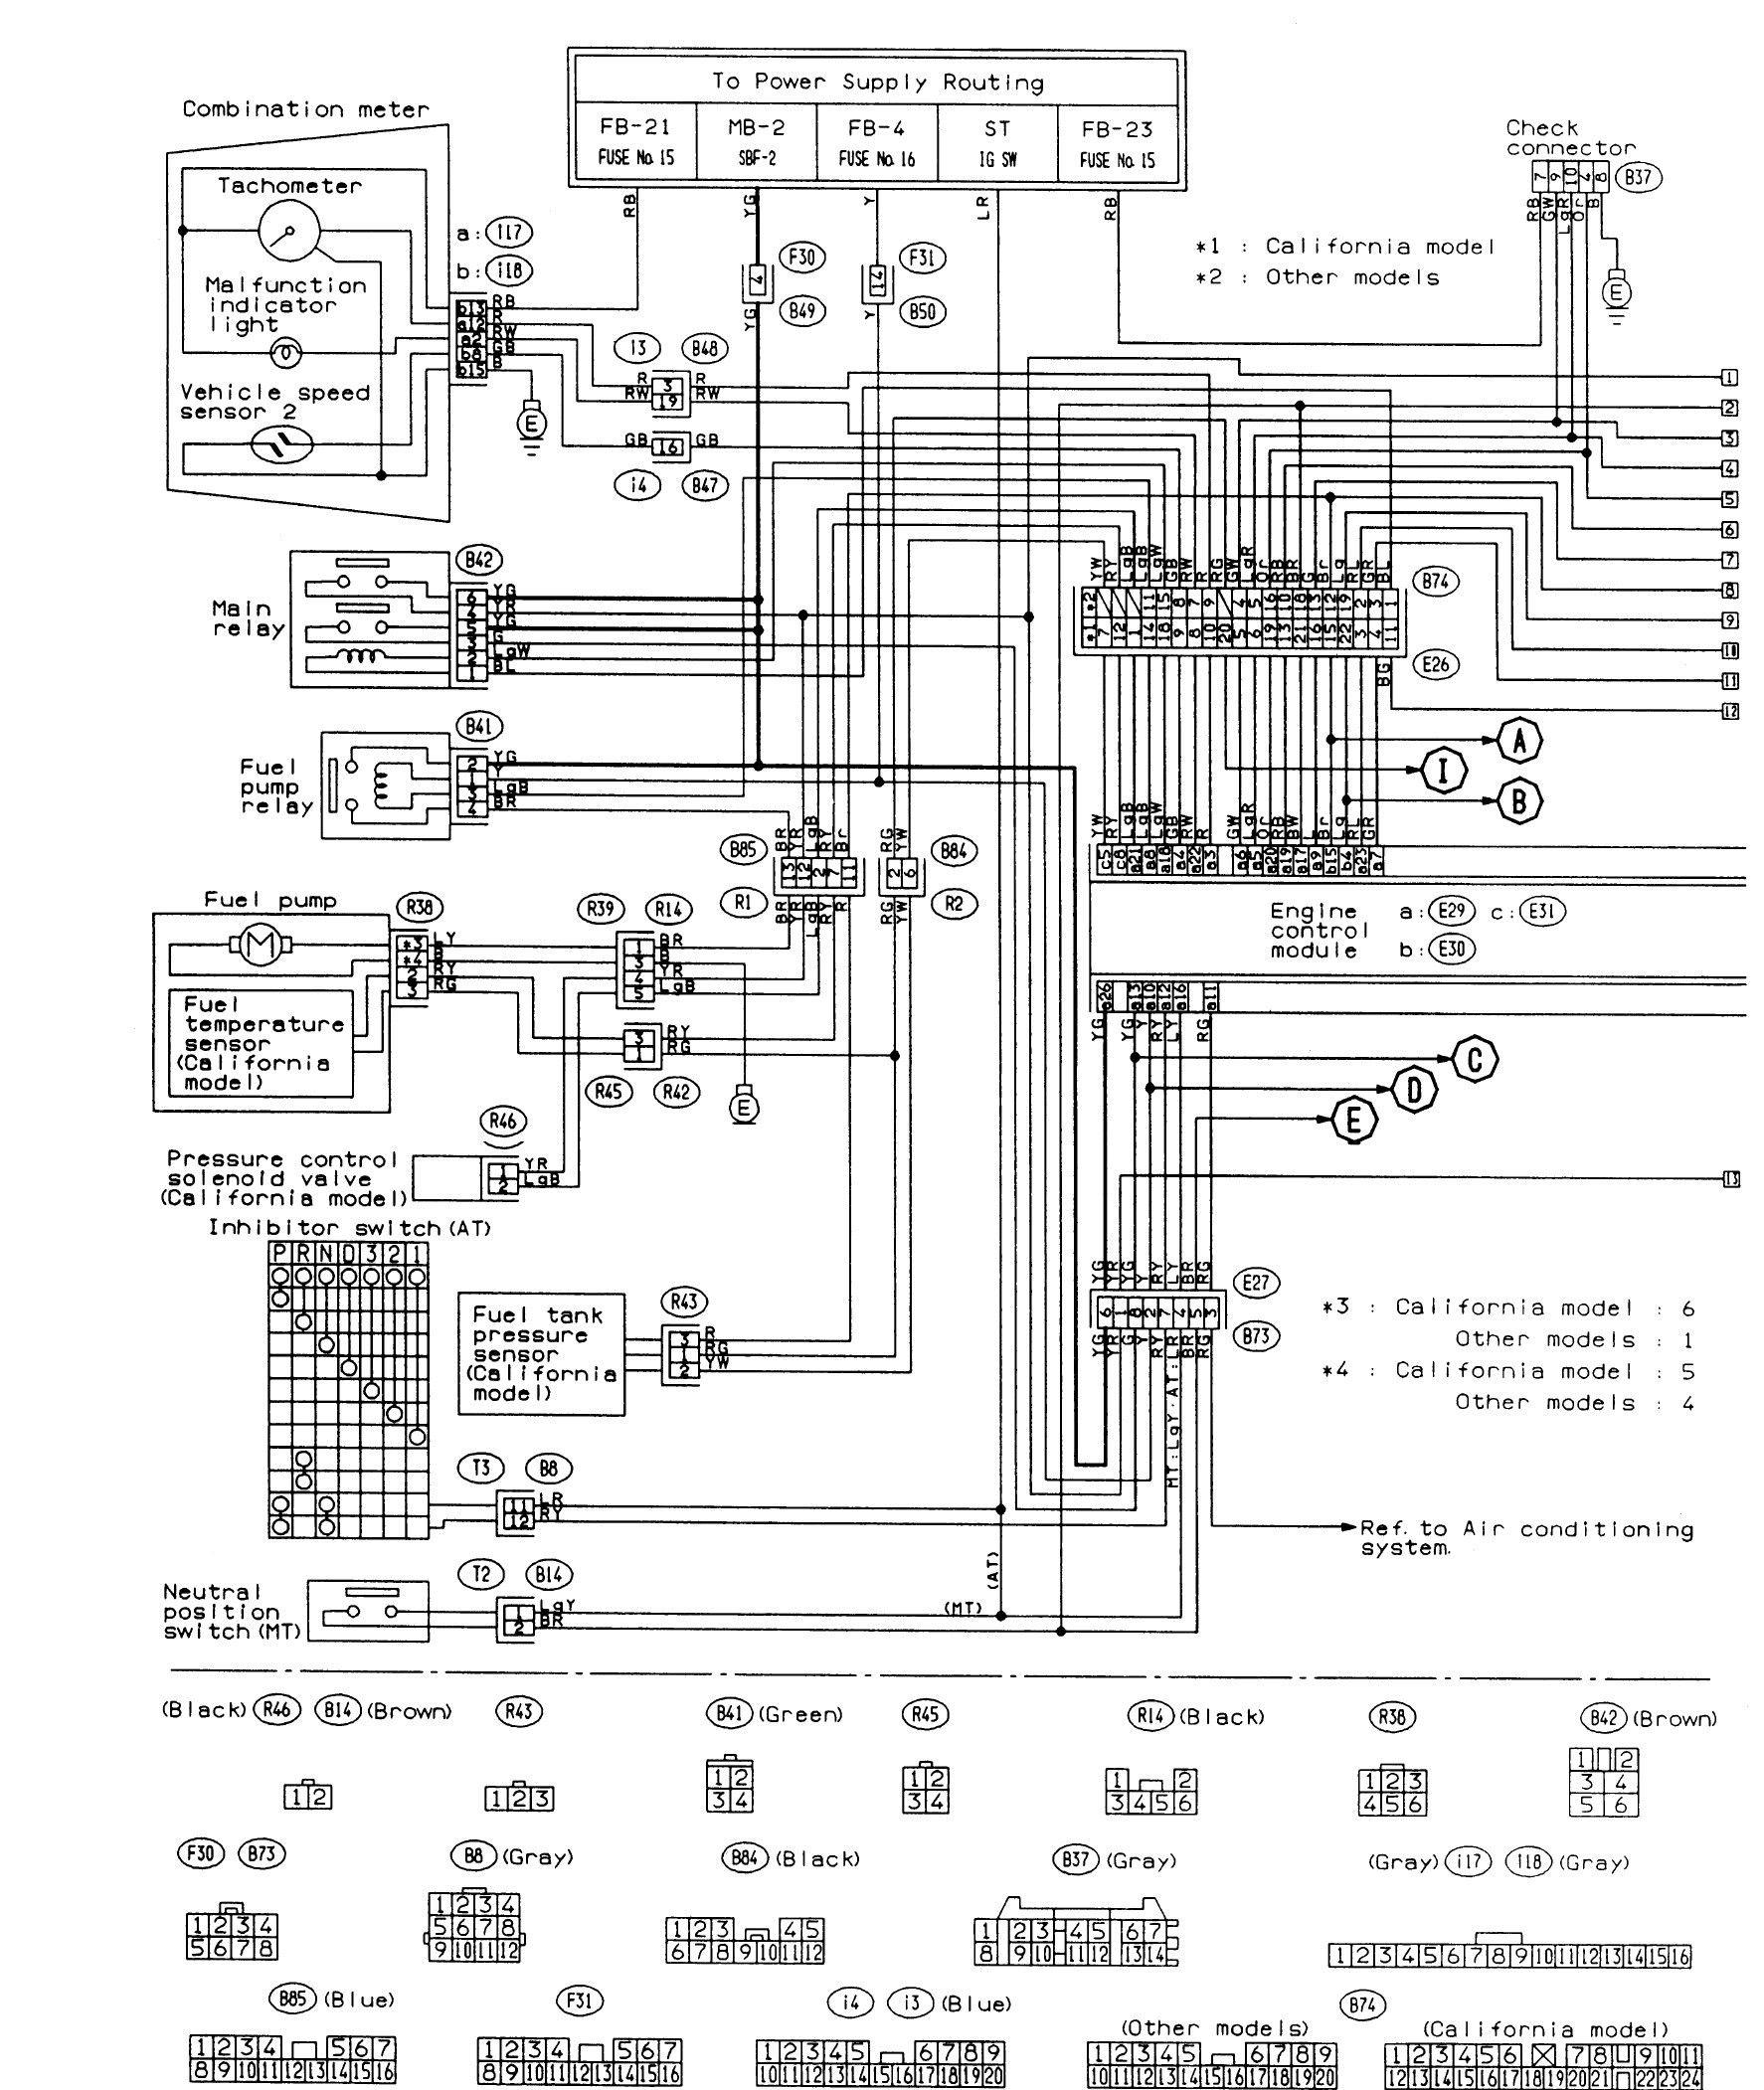 Zd 6915 Subaru Wiring Colour Codes Download Diagram